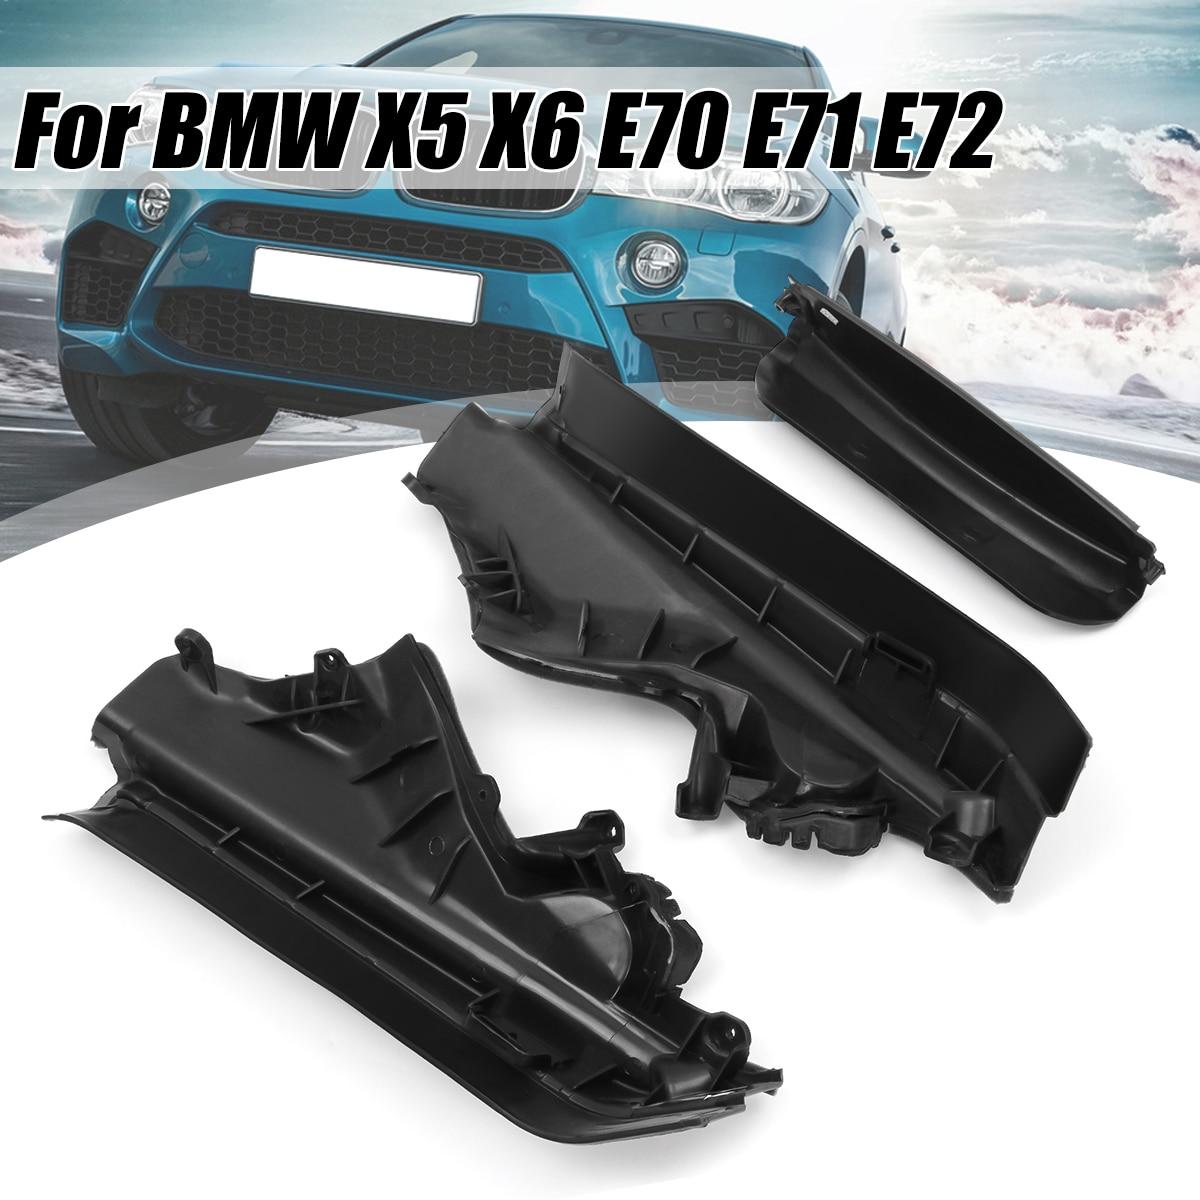 Bmw x5 x6 e70 블랙 플라스틱 용 3x 자동차 엔진 상부 칸막이 파티션 패널 세트 51717169419 51717169420 51717169421